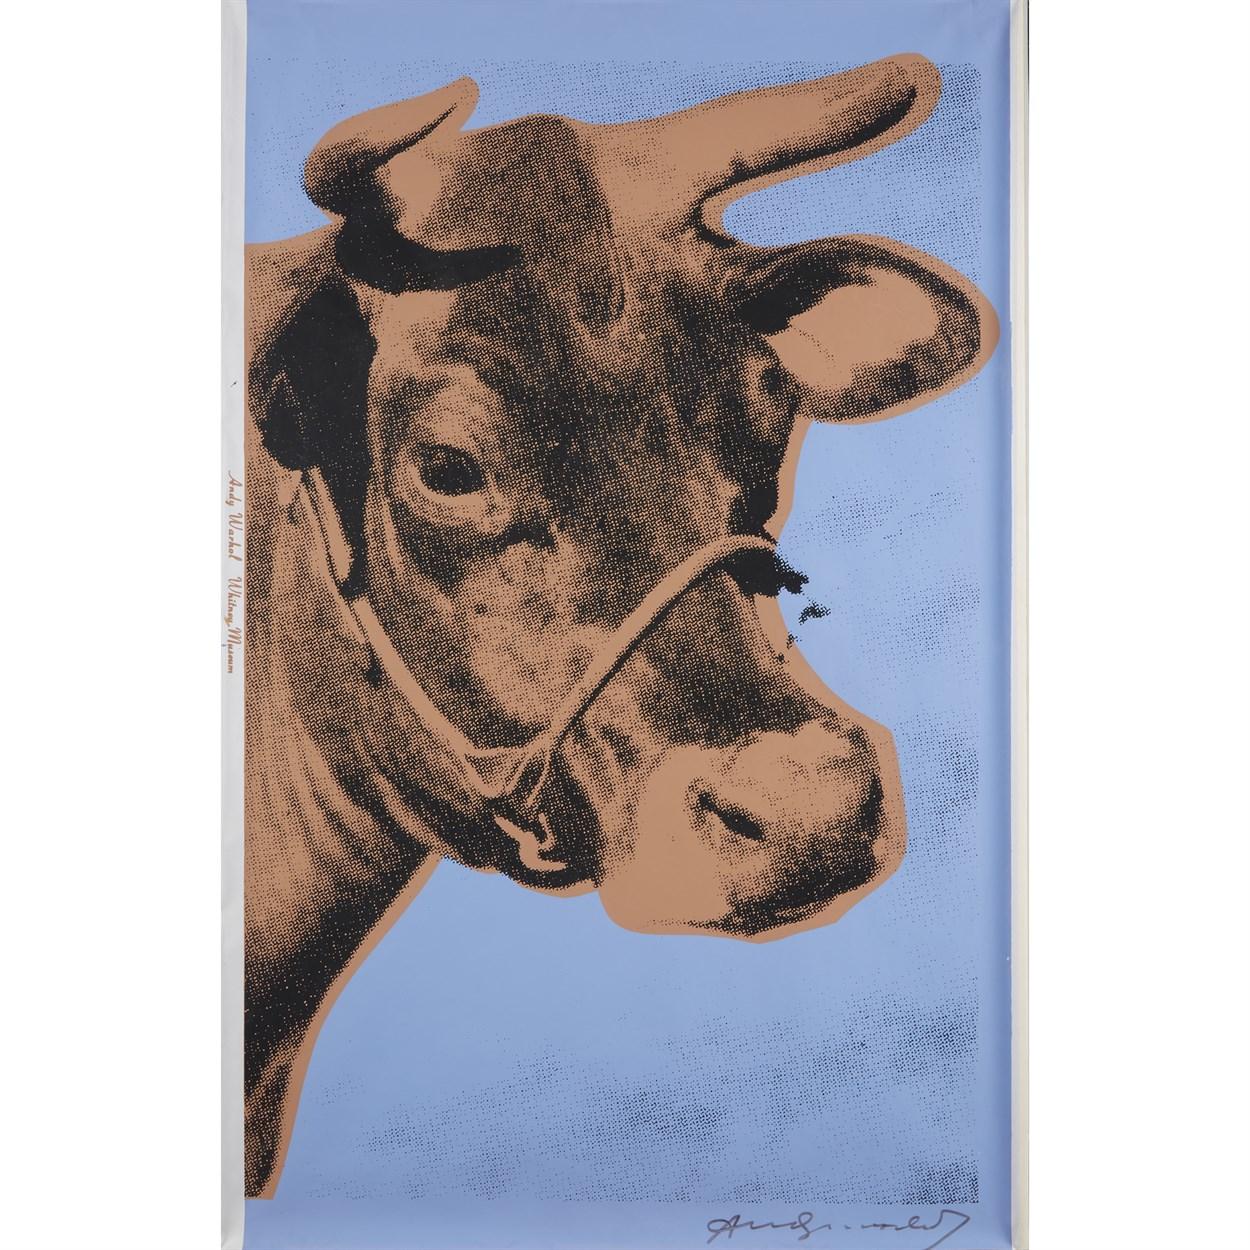 Lot 66 - Andy Warhol (American, 1928-1987)